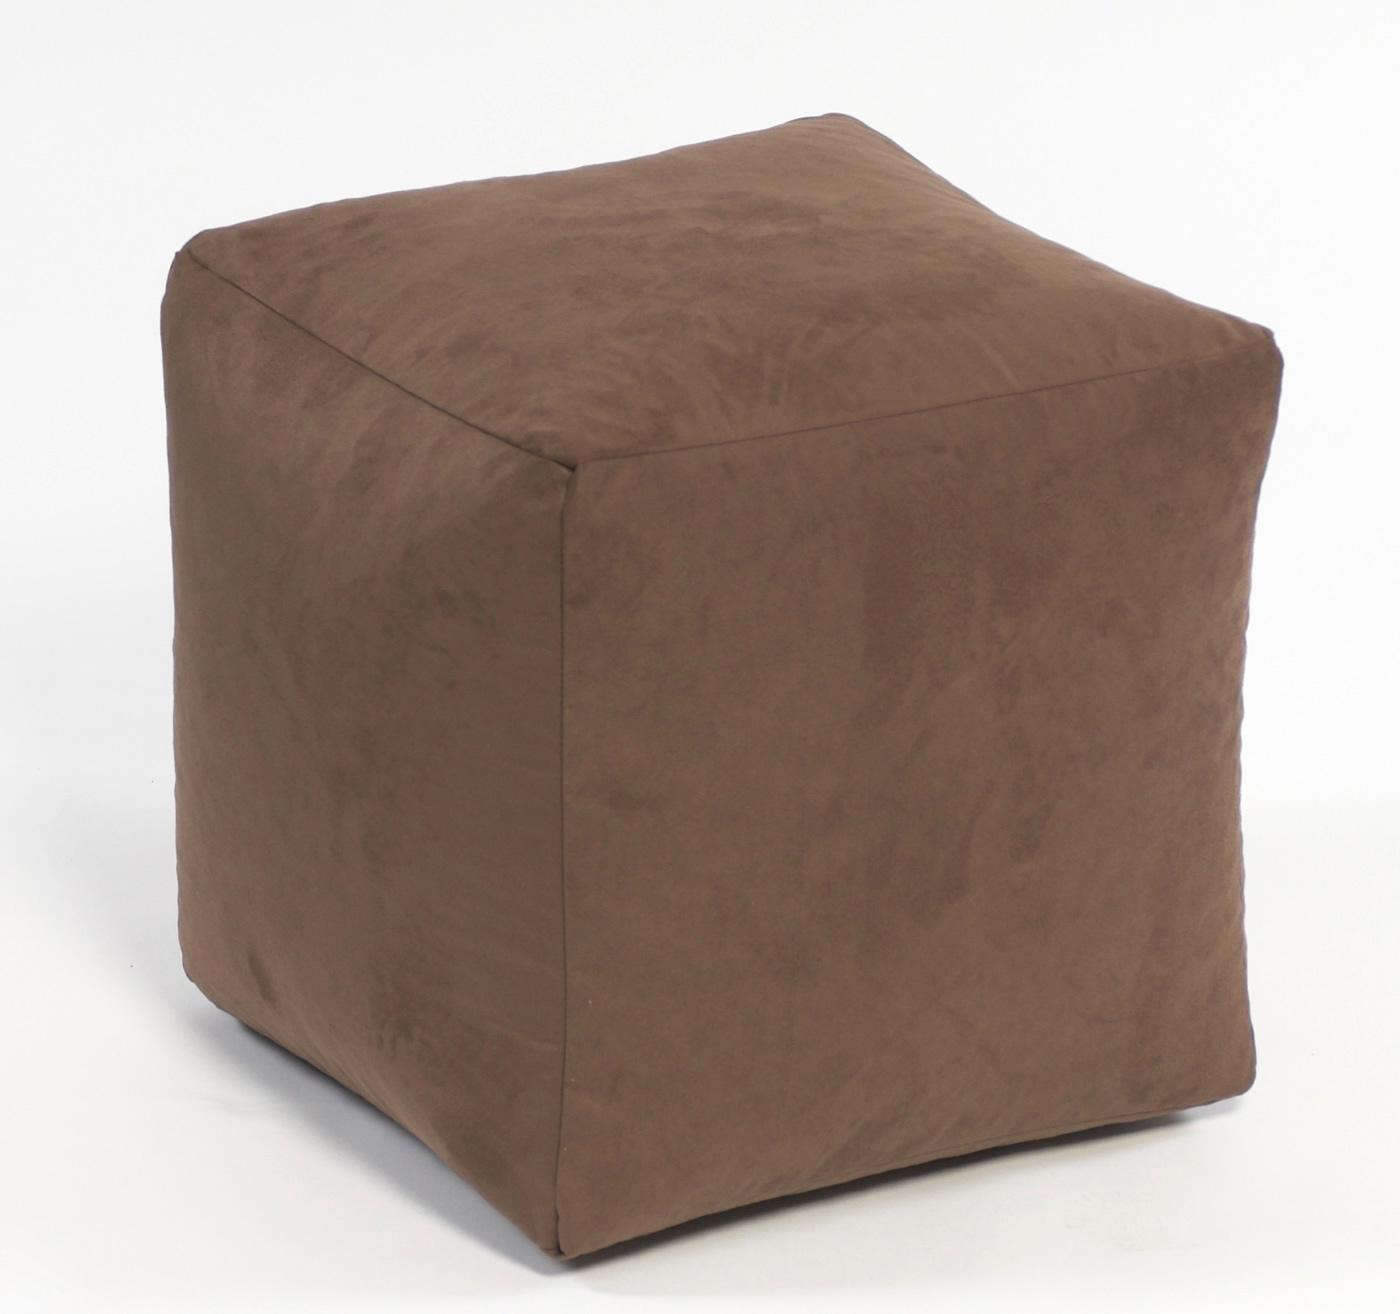 Outstanding Footstool Cube Faux Suede Creativecarmelina Interior Chair Design Creativecarmelinacom